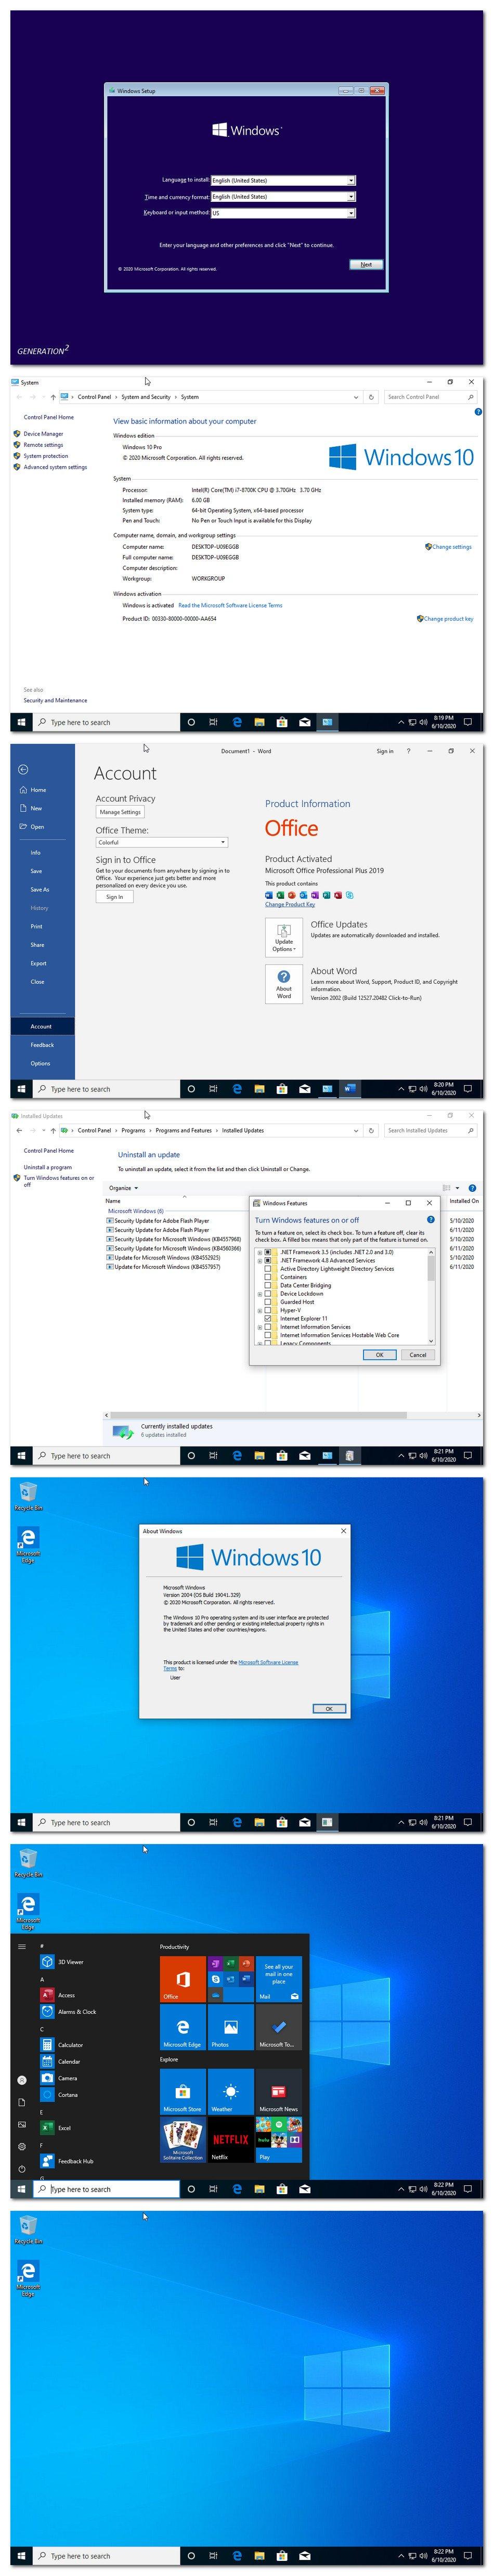 Download Windows 10 X64 Pro Version 2004 Build 19041.329 ...